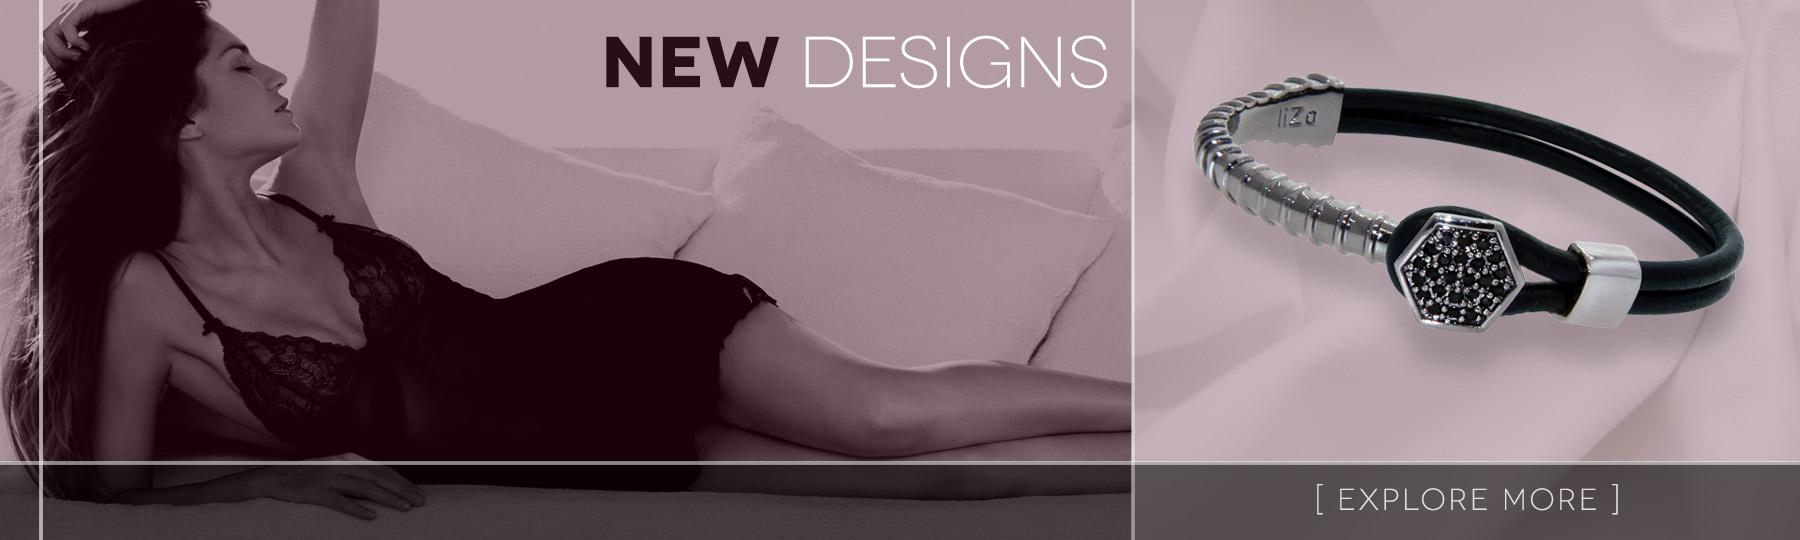 banner-new-designs-2-23-16-mh.jpg